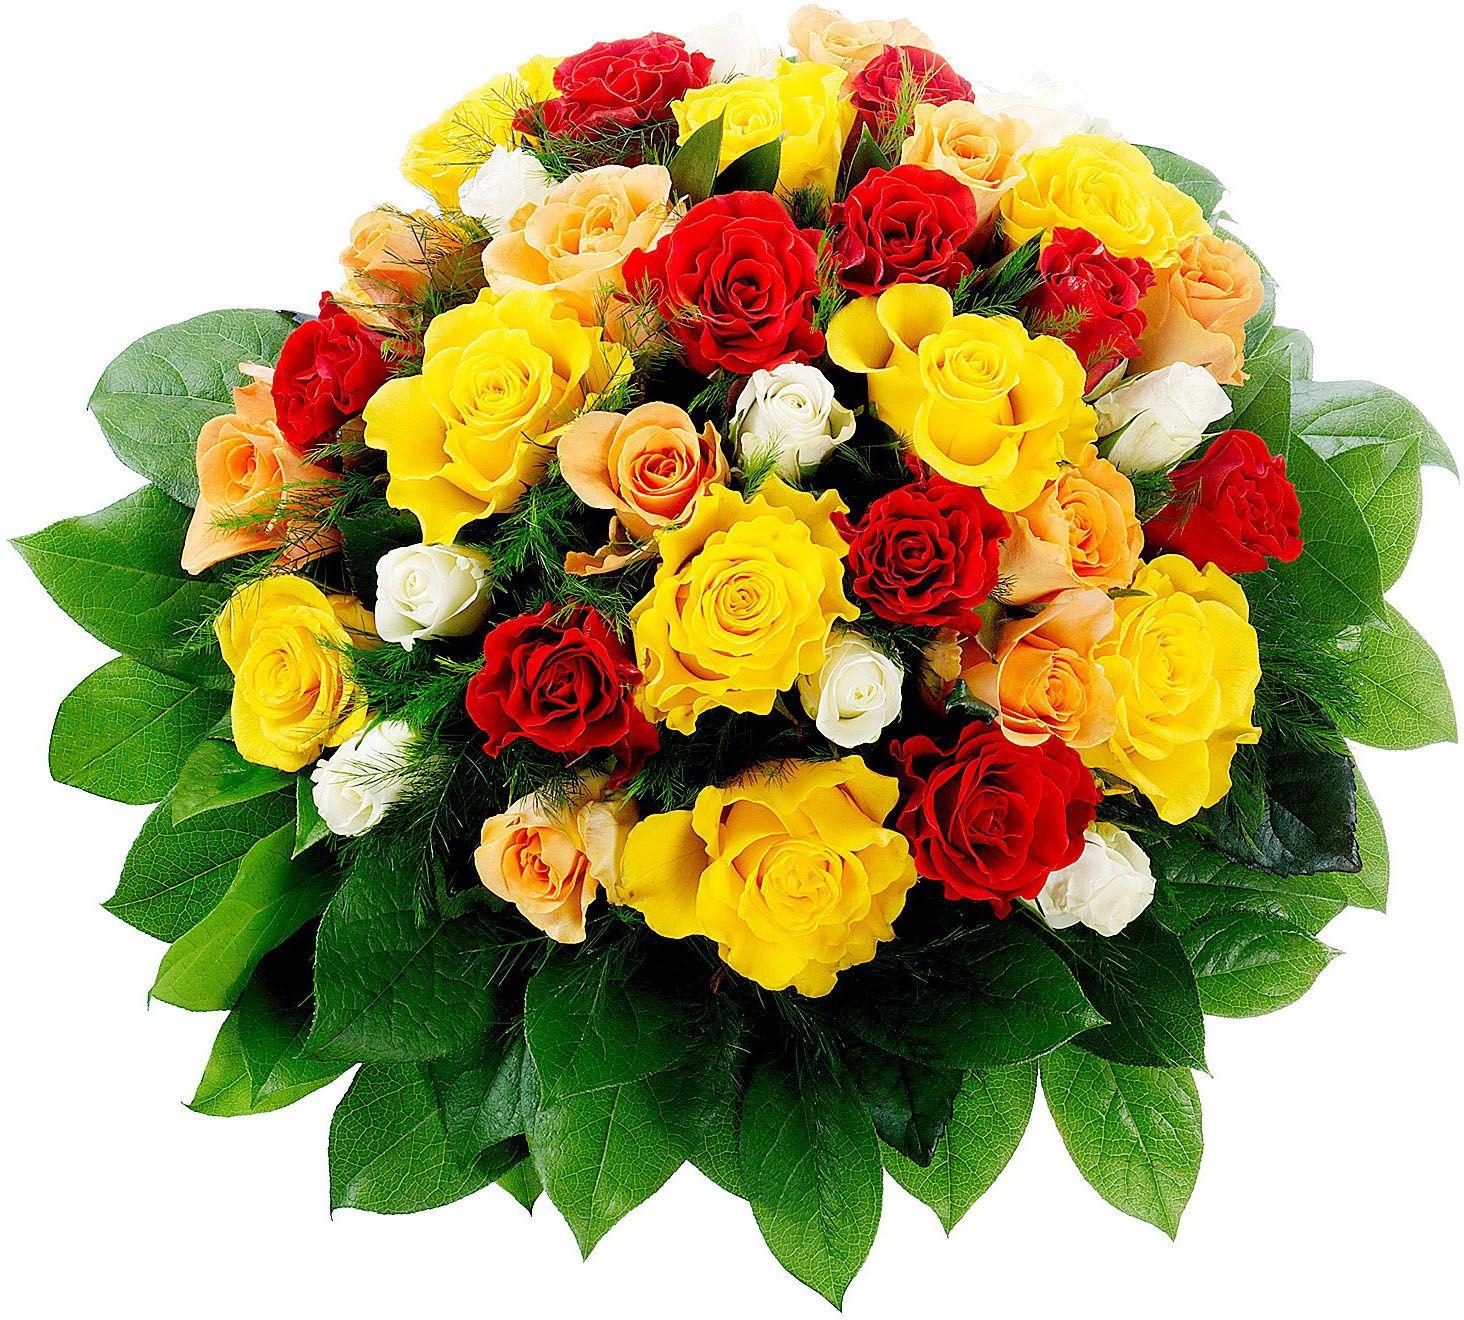 Создаем цветы из фоамирана на мастерклассе астру